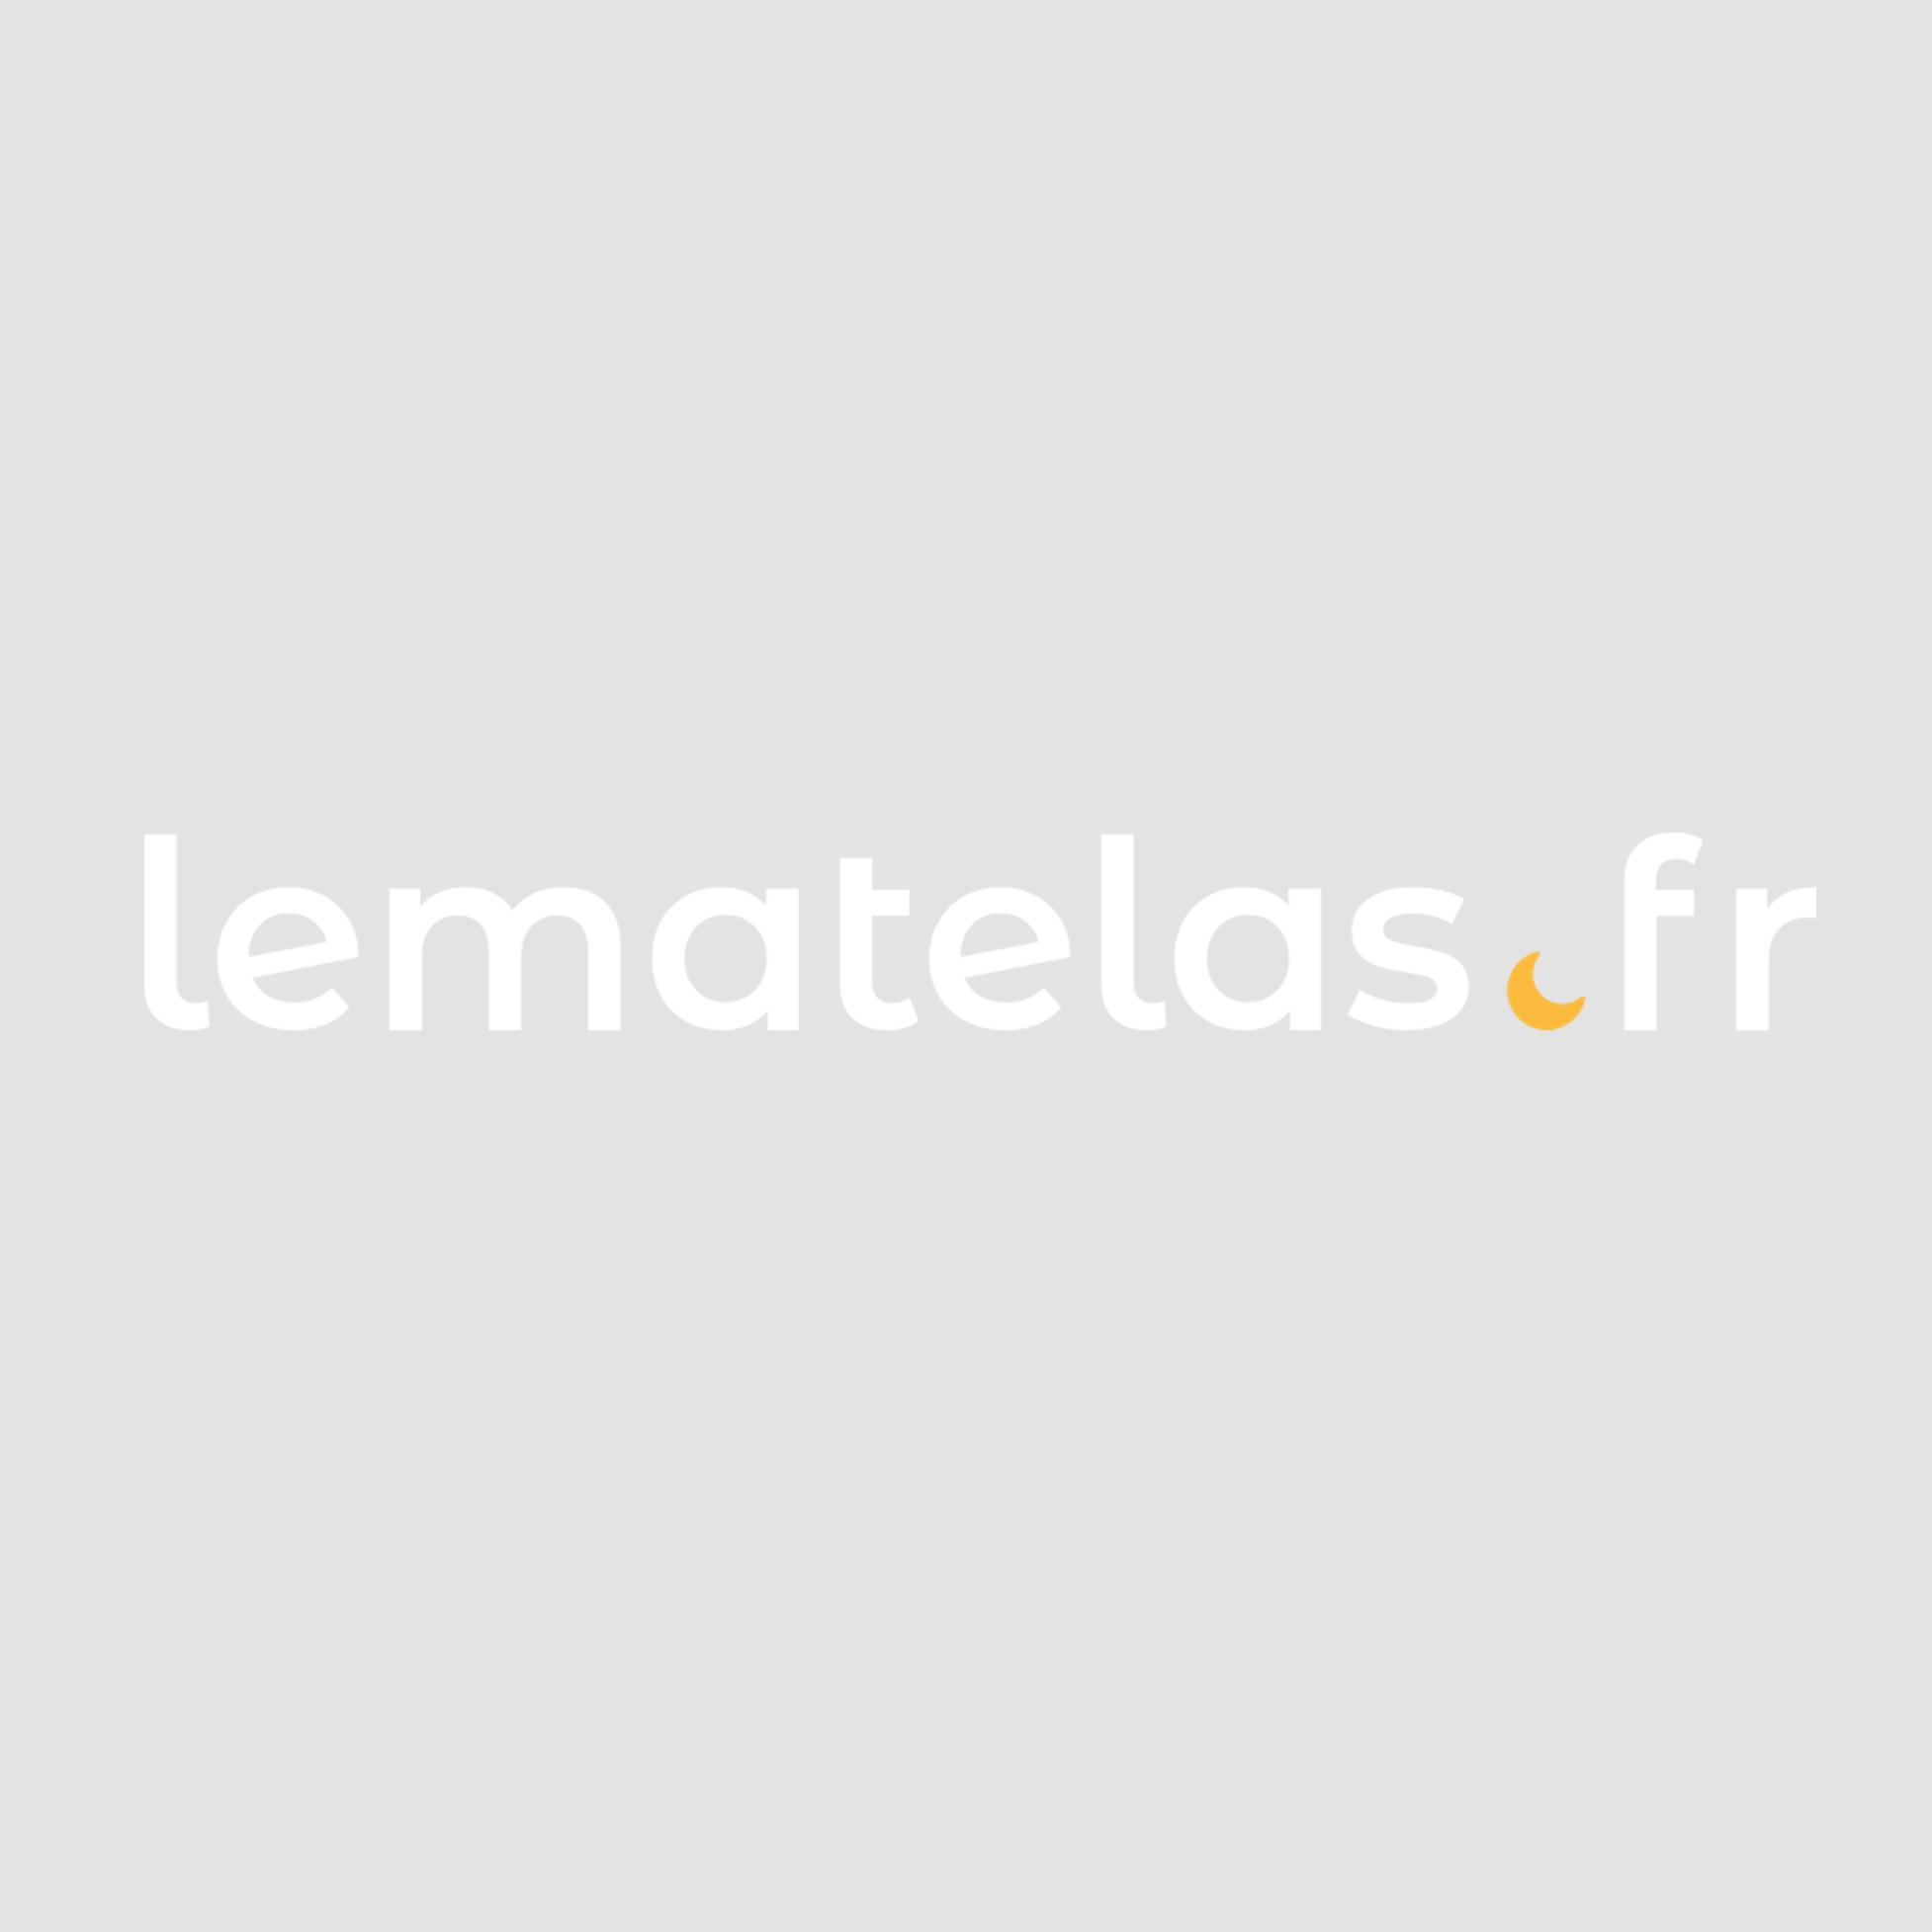 sommier tapissier en livraison gratuite. Black Bedroom Furniture Sets. Home Design Ideas